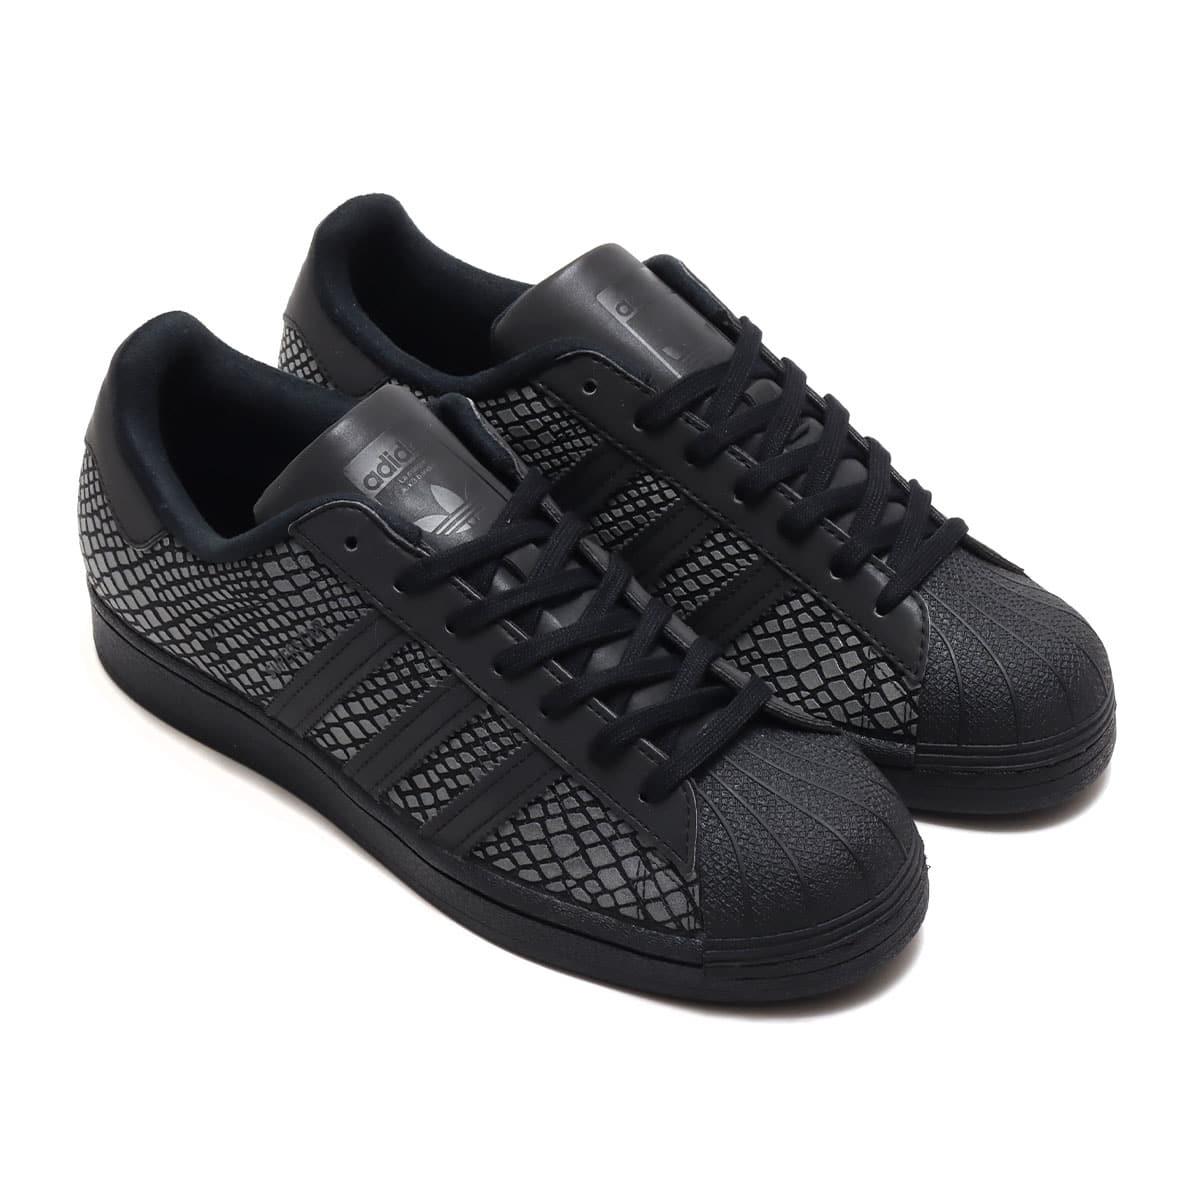 "adidas SUPERSTAR ATMOS ""R-SNK"" CORE BLACK/CORE BLACK/GRAY SIX 20SS-S_photo_large"